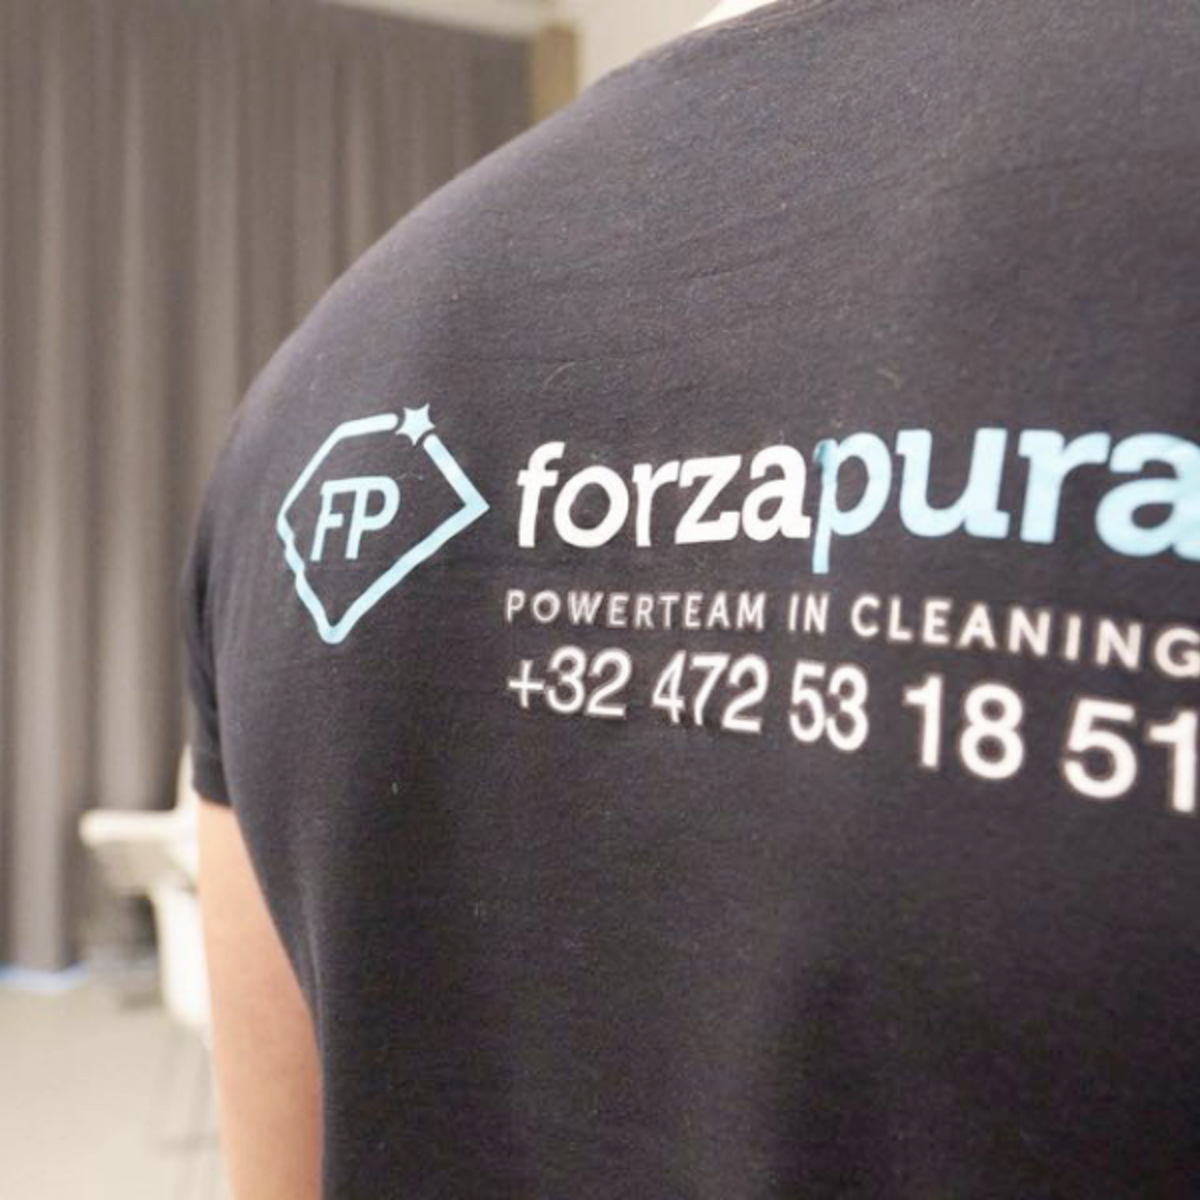 ForzaPura